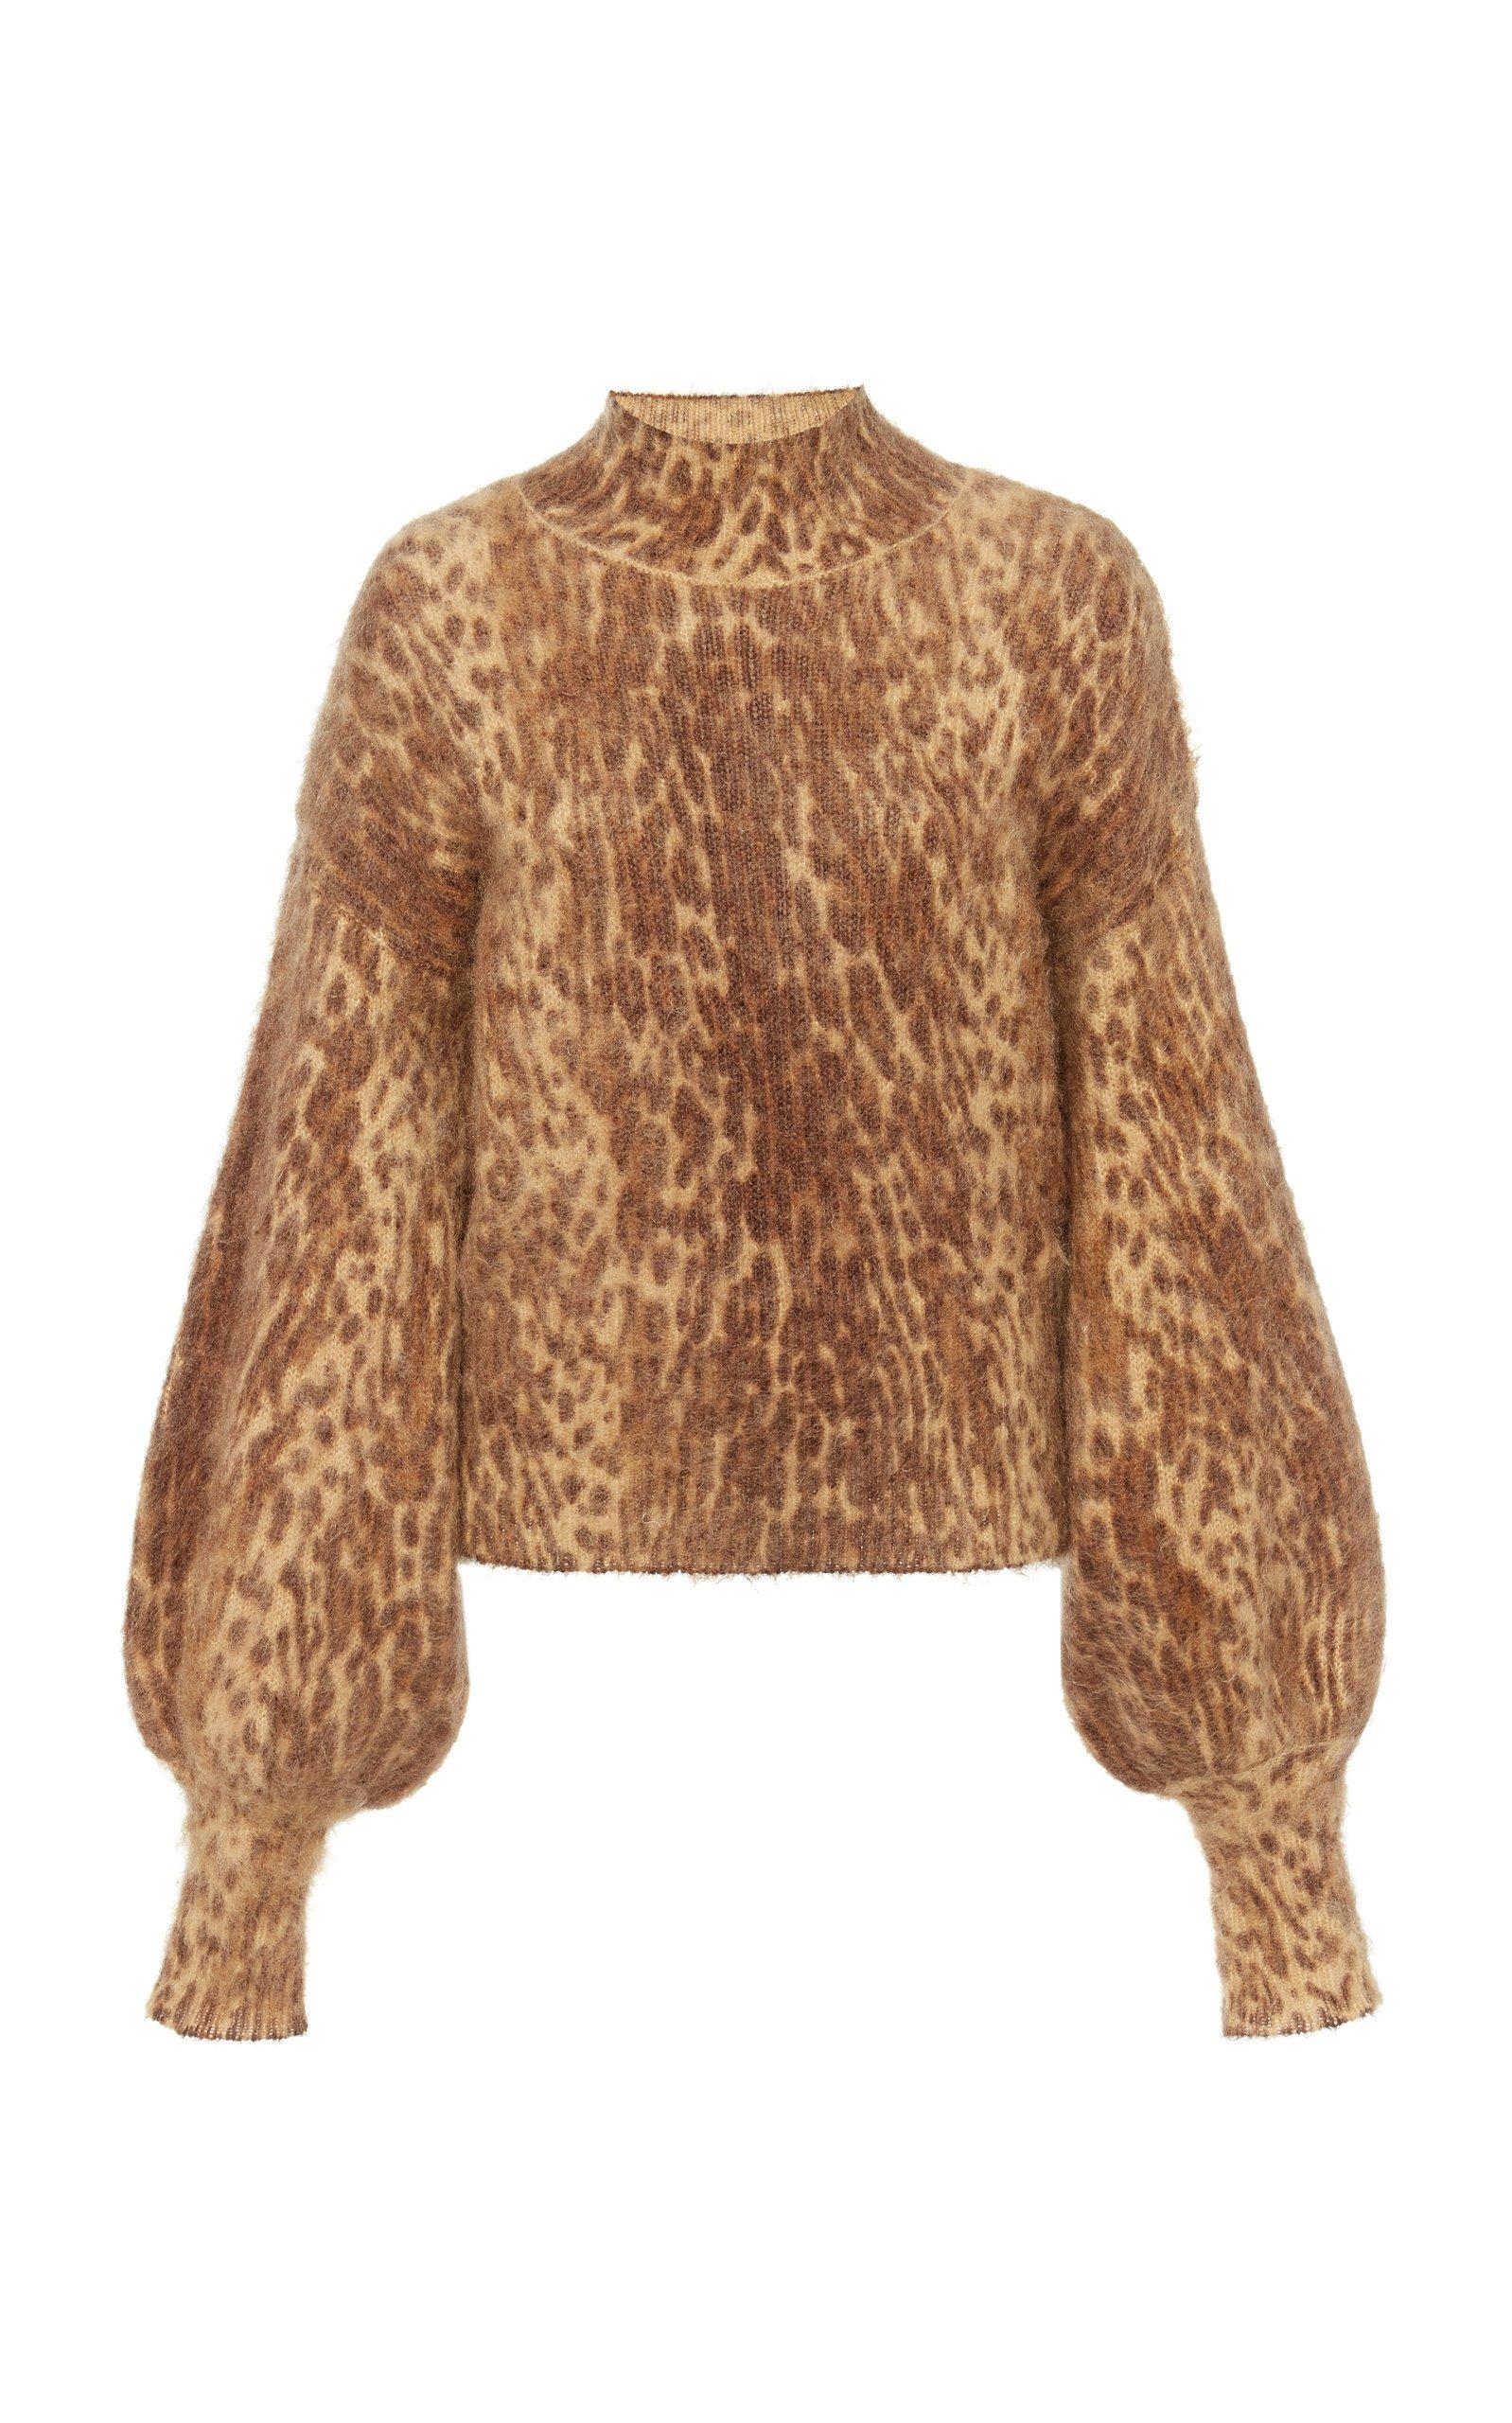 Printed Mohair-Blend Sweater by Zimmermann | Moda Operandi